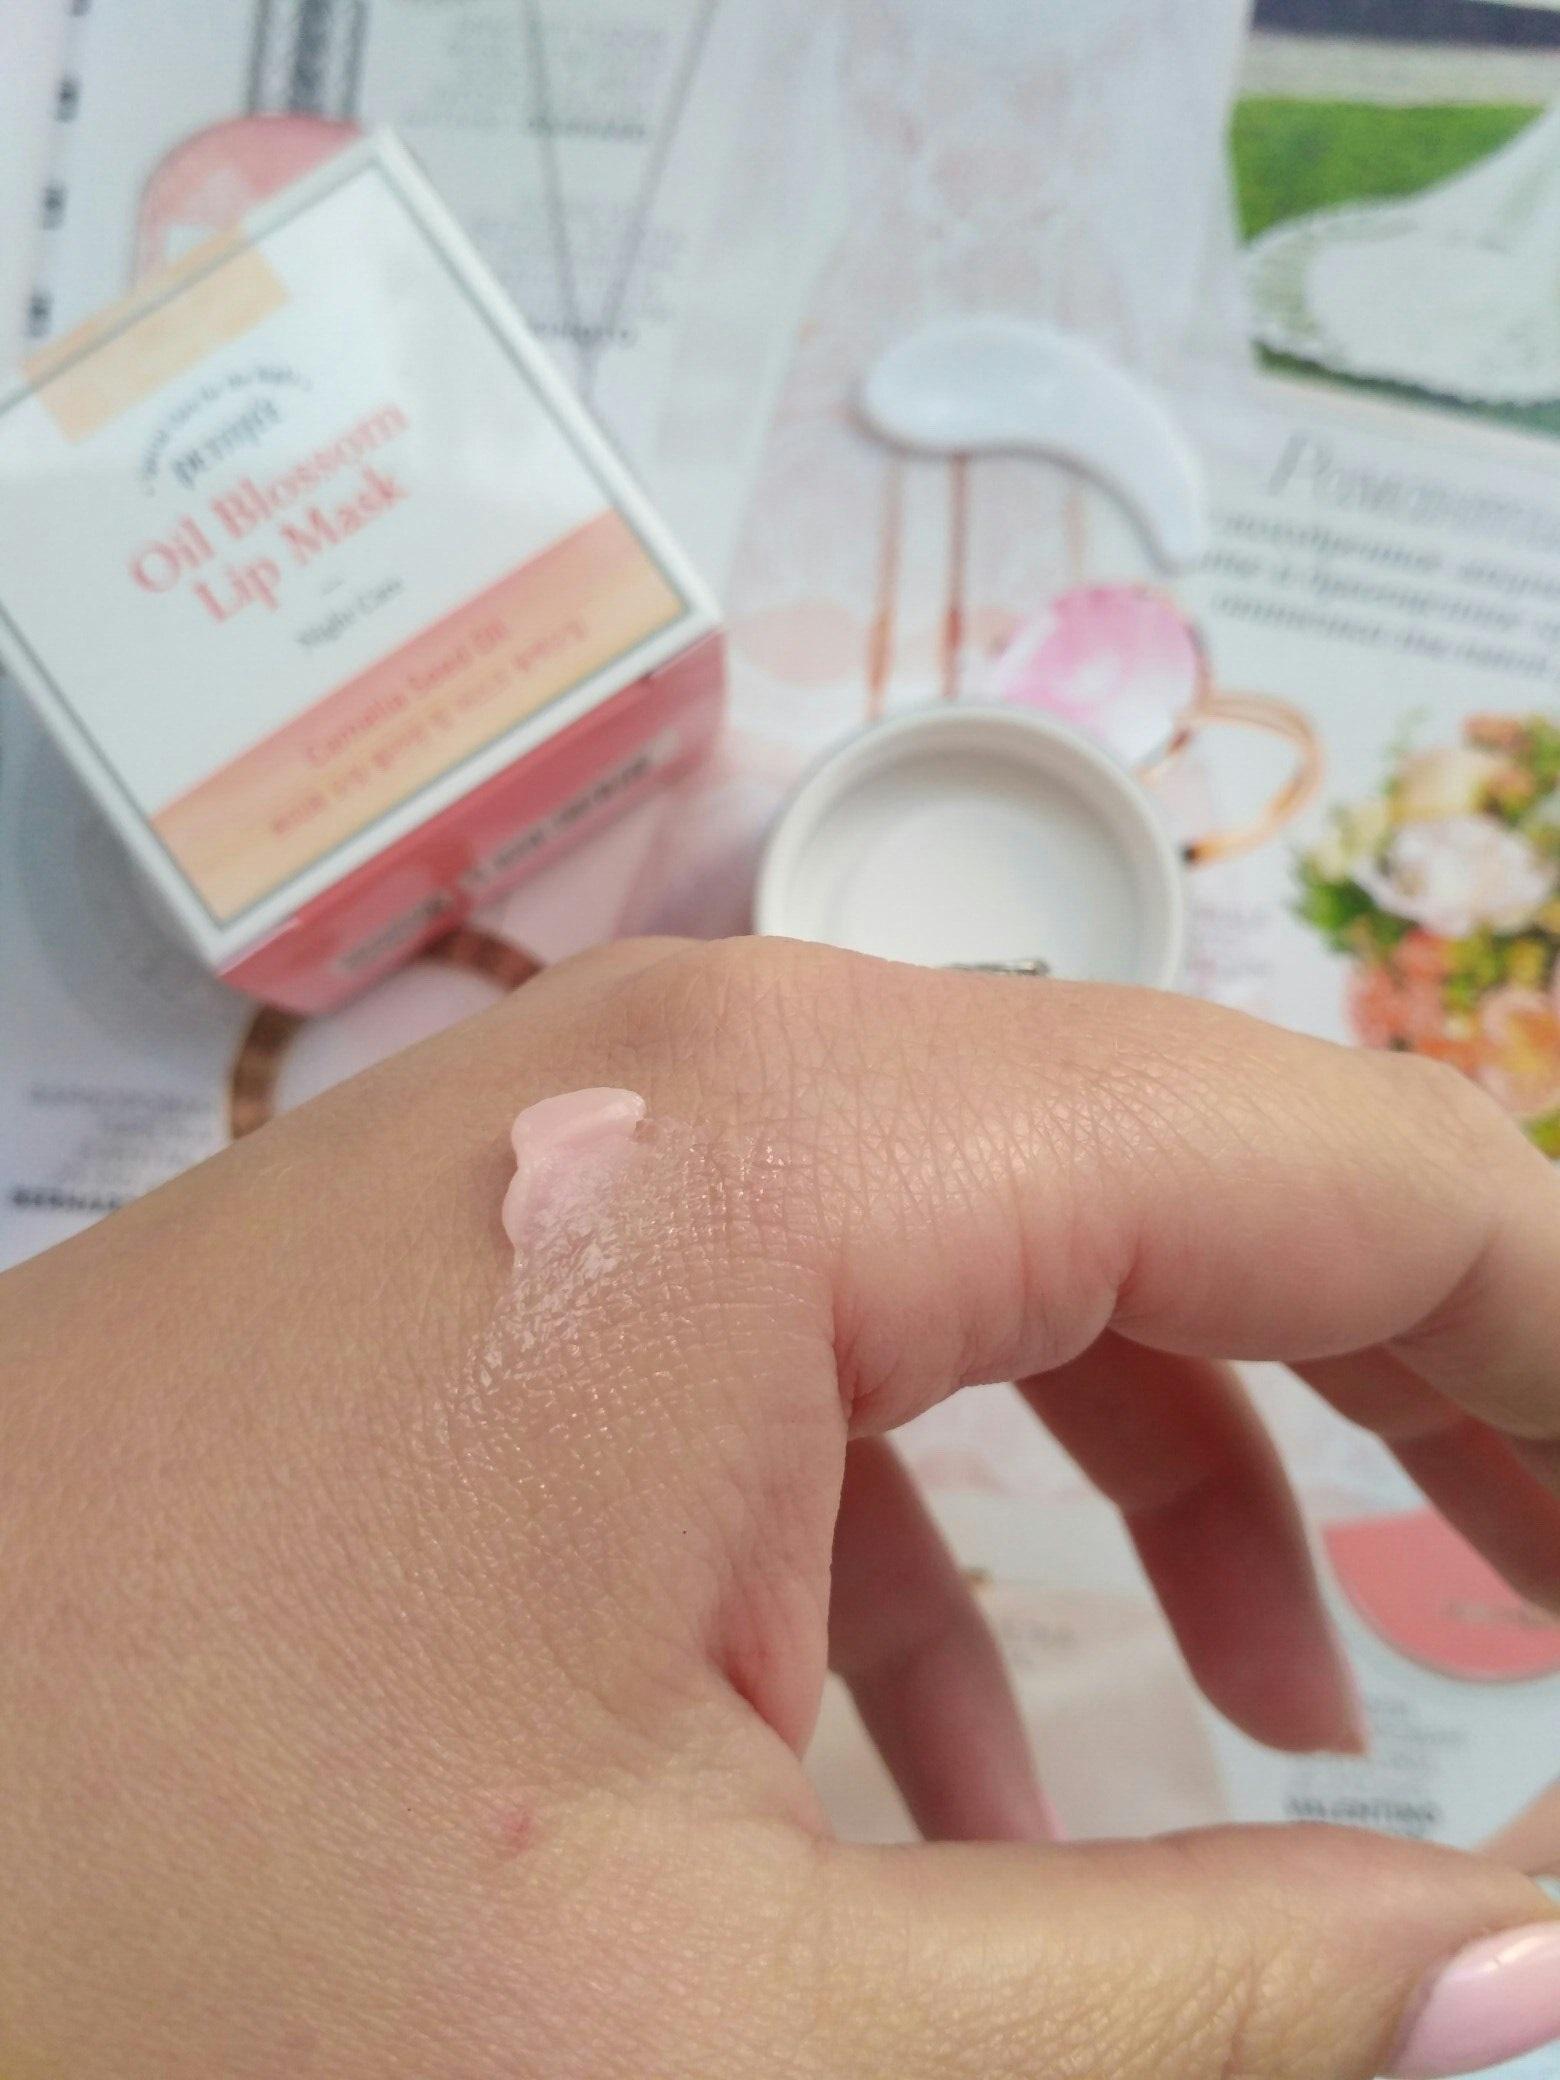 PETITFEE Маска для губ с маслом камелии Oil Blossom Lip mask (Camellia seed oil)